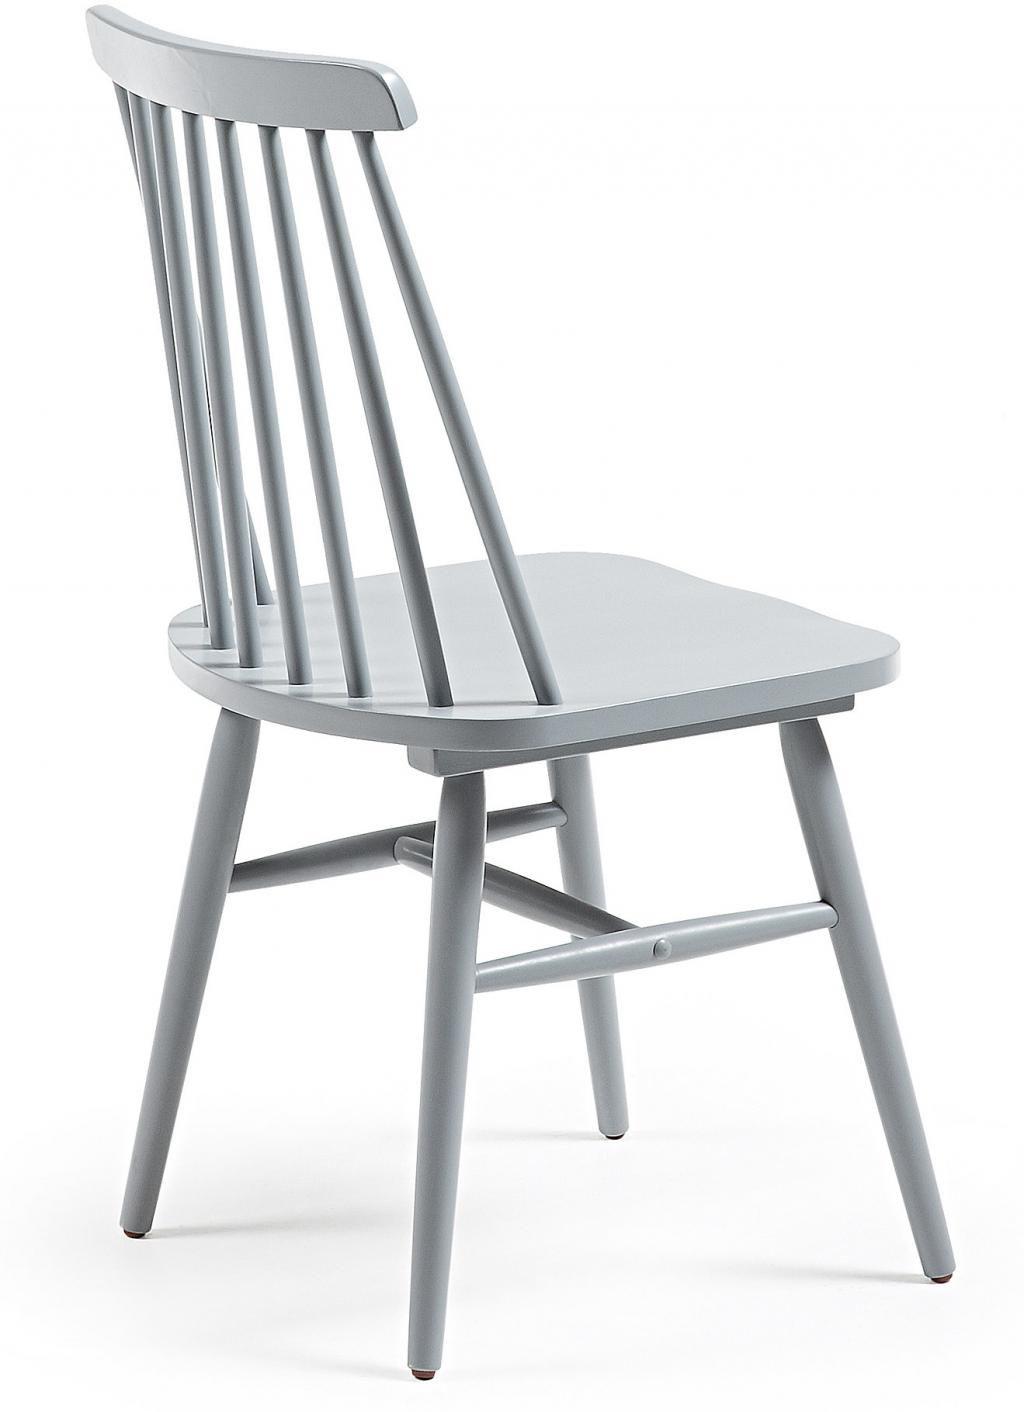 stuhl kristie holz grau la forma kaufen wohn und lifestylewebshop. Black Bedroom Furniture Sets. Home Design Ideas